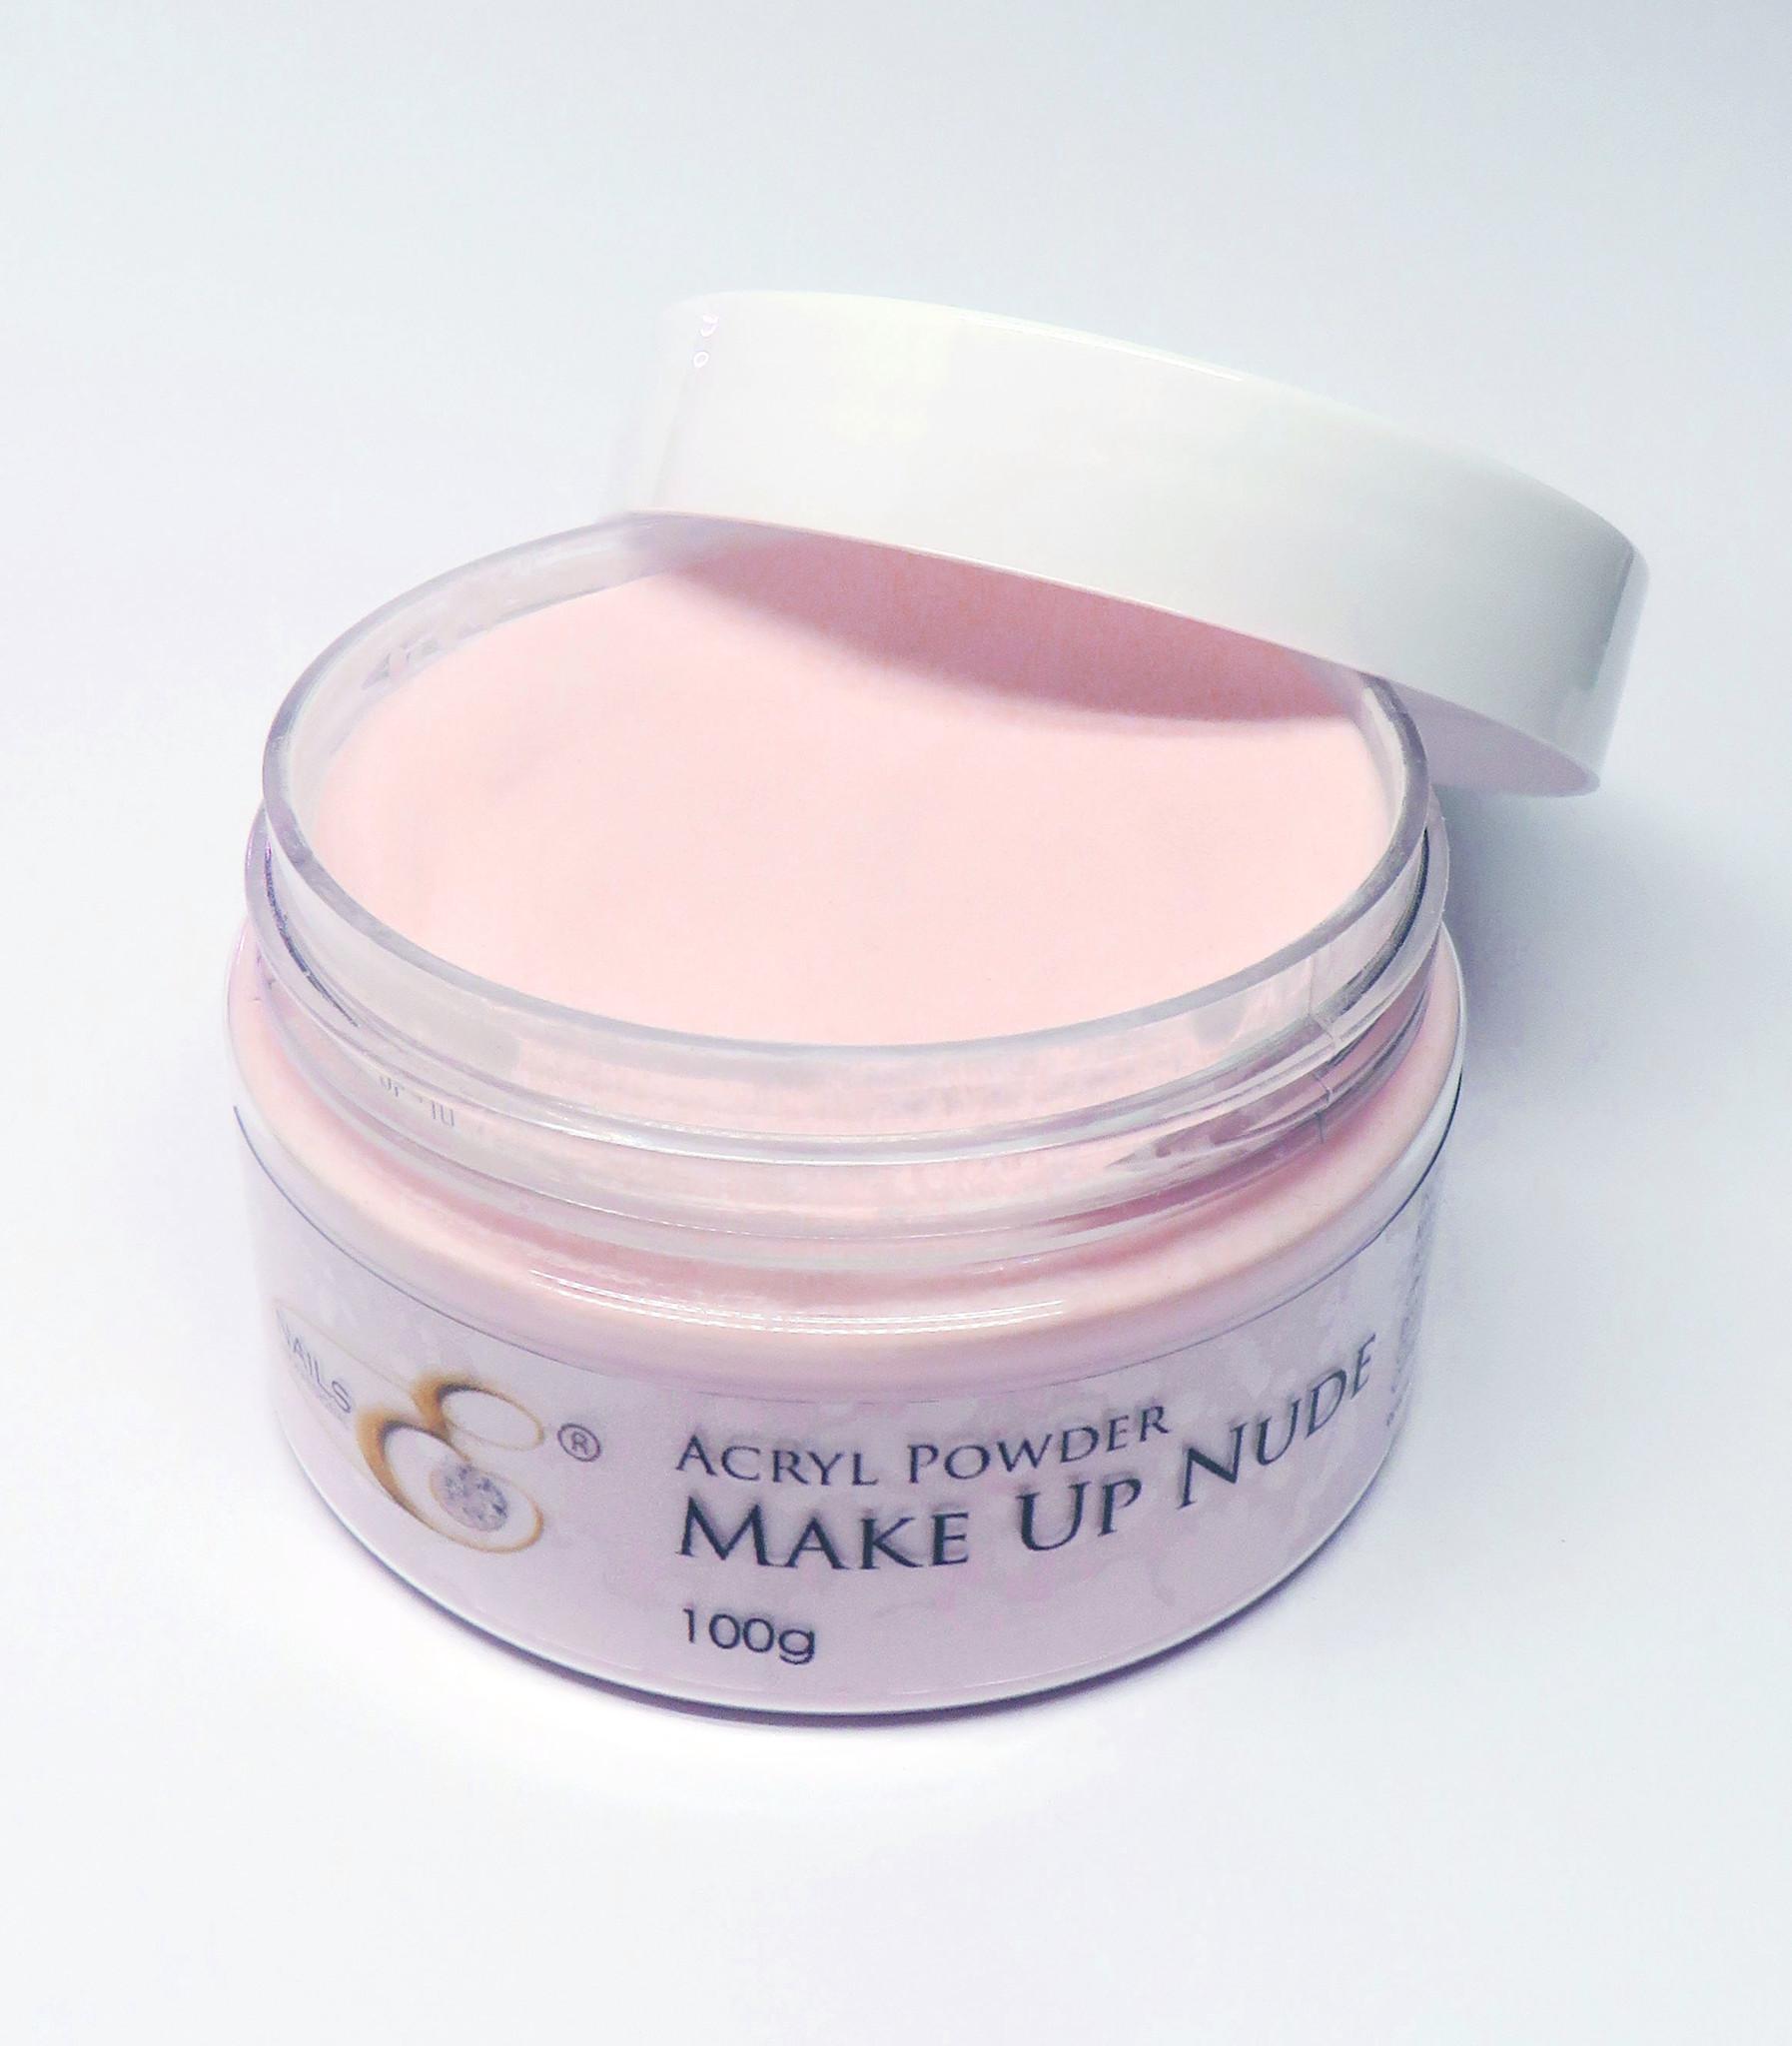 NailsE Professional Acryl Powder Make Up Nude, 100g